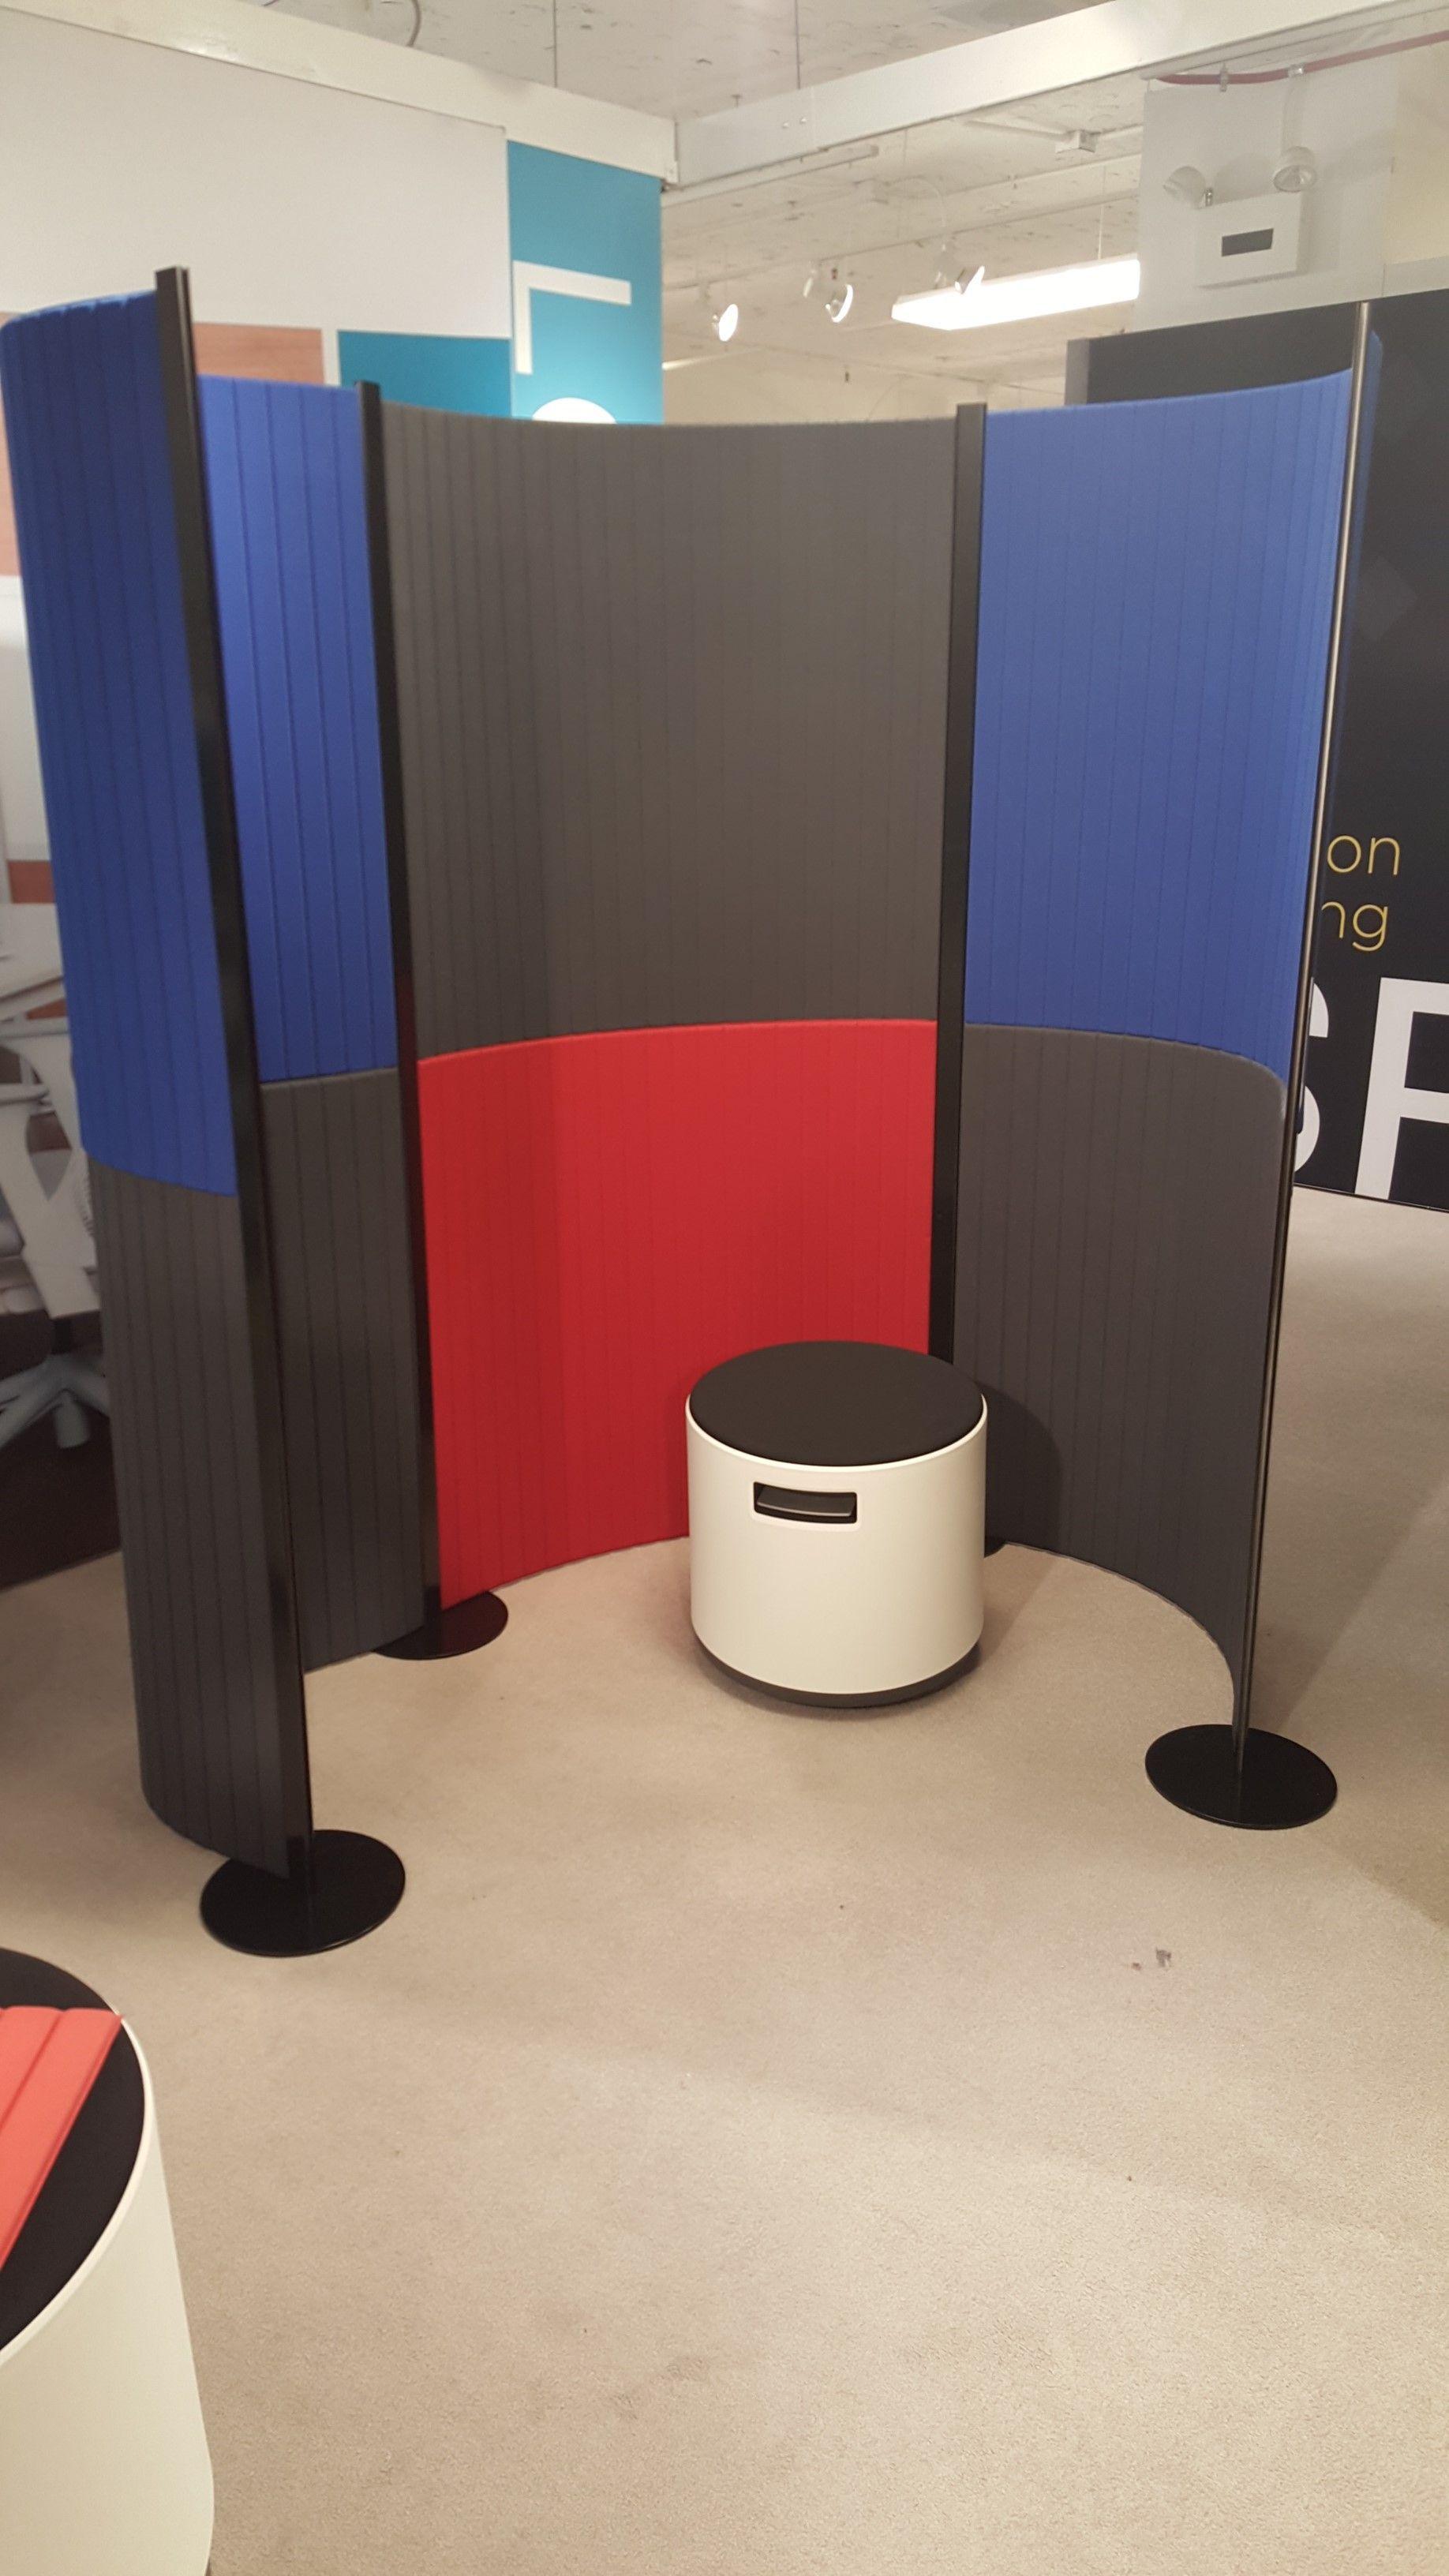 Loftwall modernroomdivider room divider art pinterest sliding